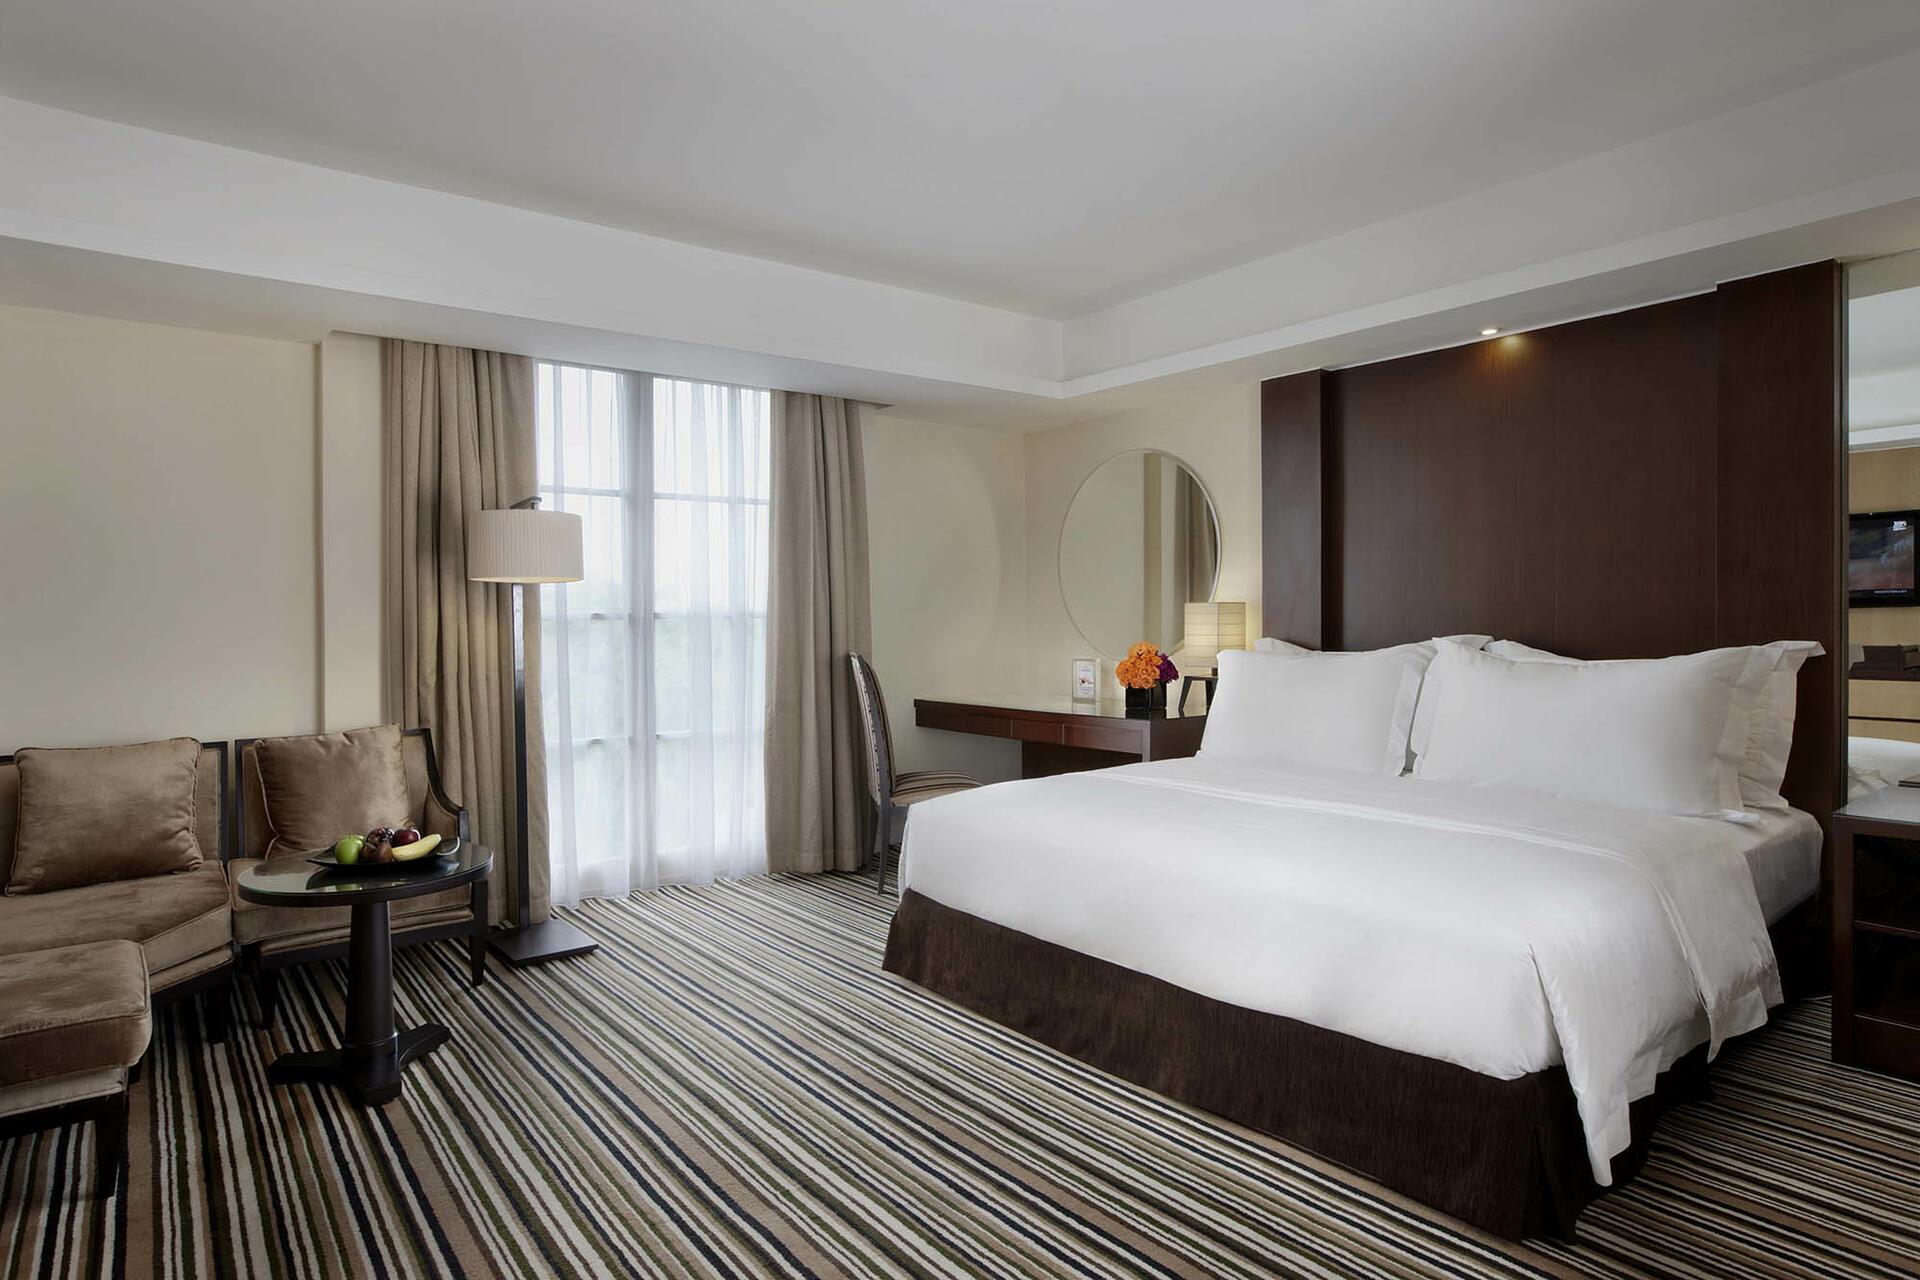 Astounding Jakarta Hotel Rooms Suites Hotel Gran Mahakam Theyellowbook Wood Chair Design Ideas Theyellowbookinfo